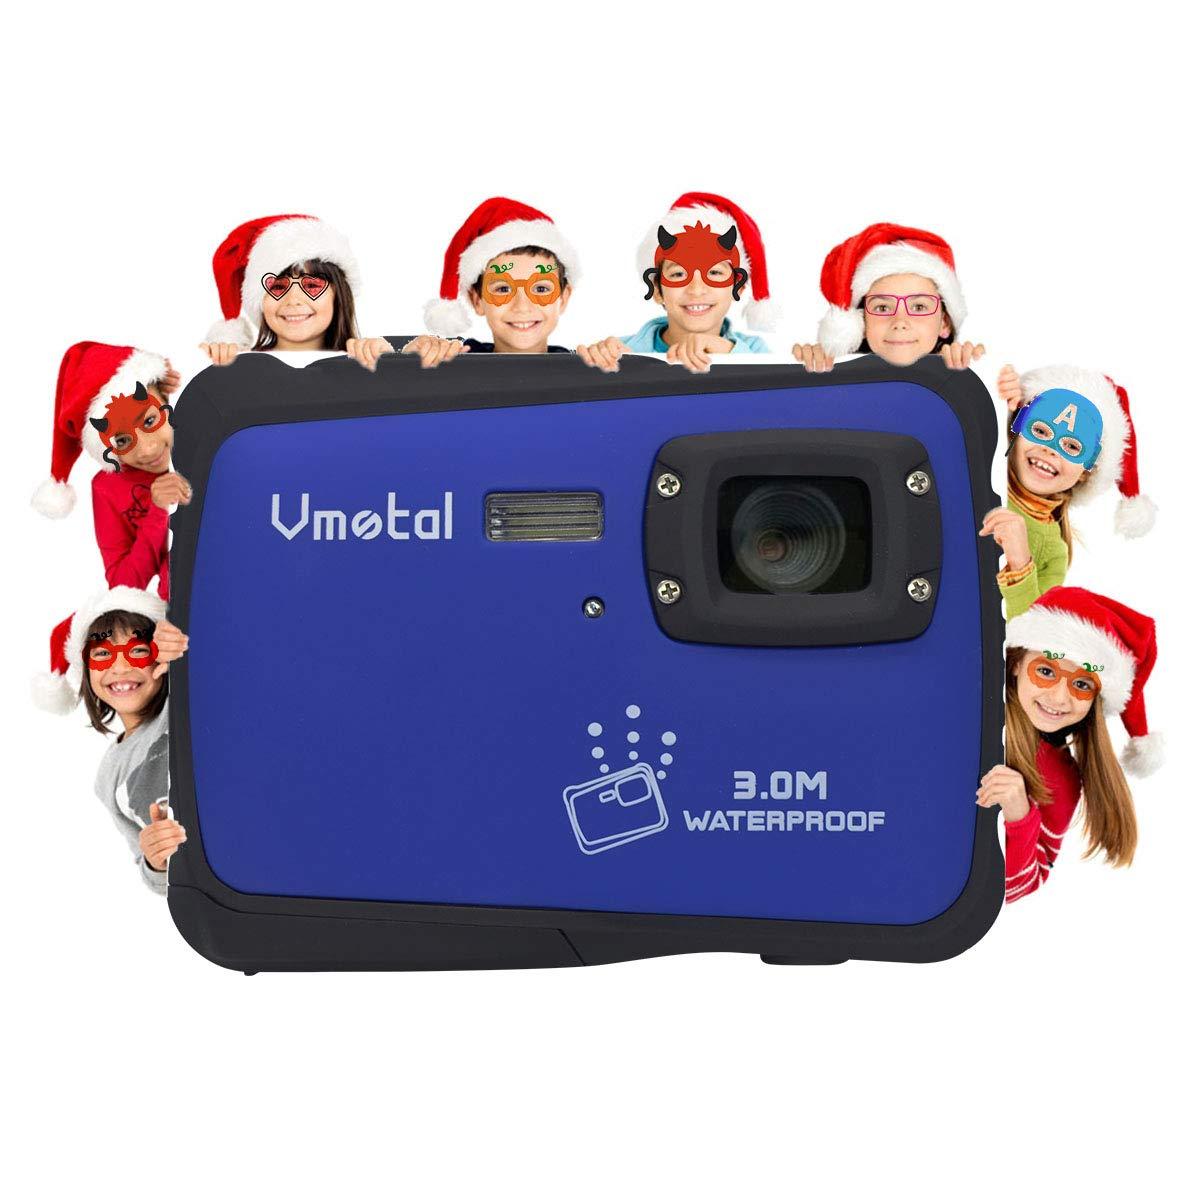 Kids Waterproof Camera, Vmotal Digital Camera for Kids 2.0 Inch TFT Display Children Kids Digital Camera (Blue) by Vmotal